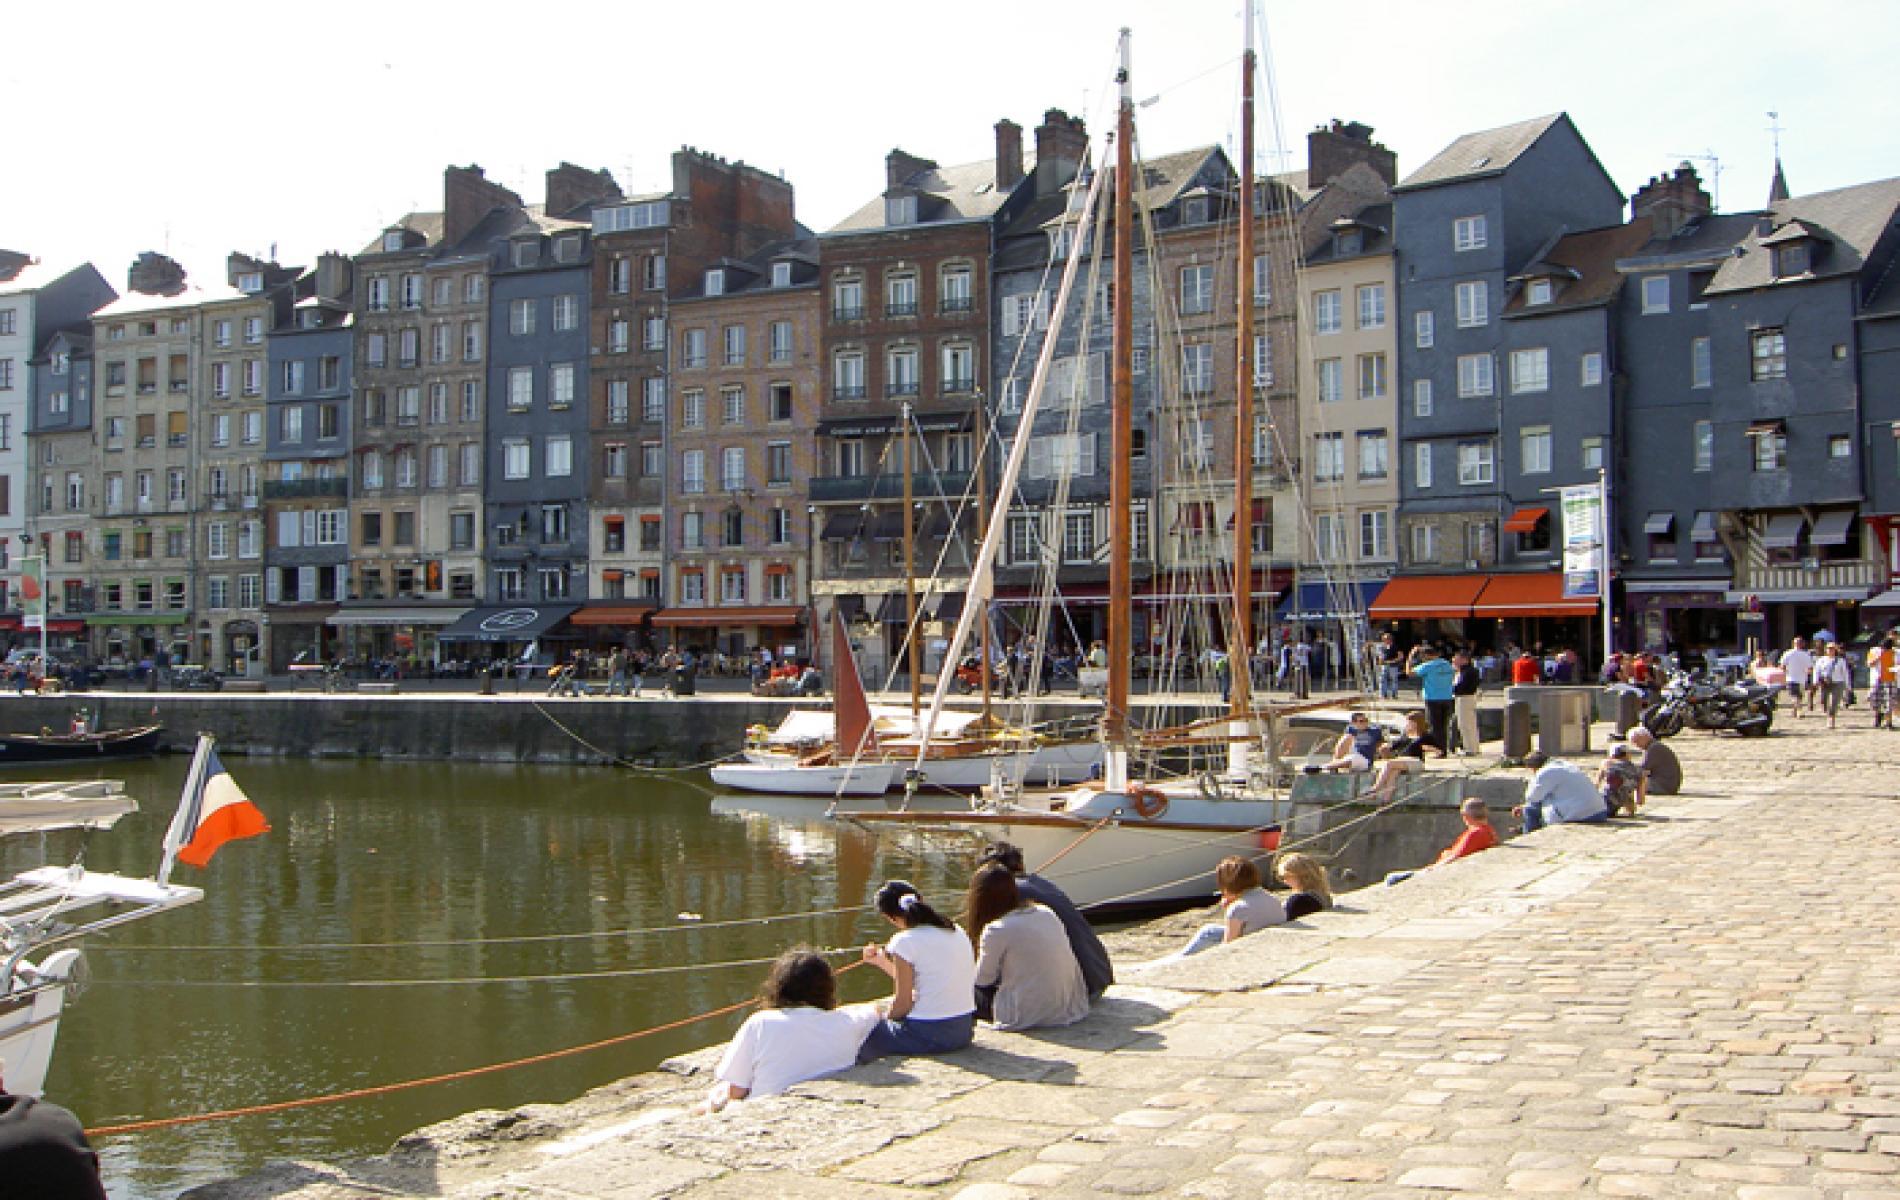 Appart Hotel à 20 min de Deauville